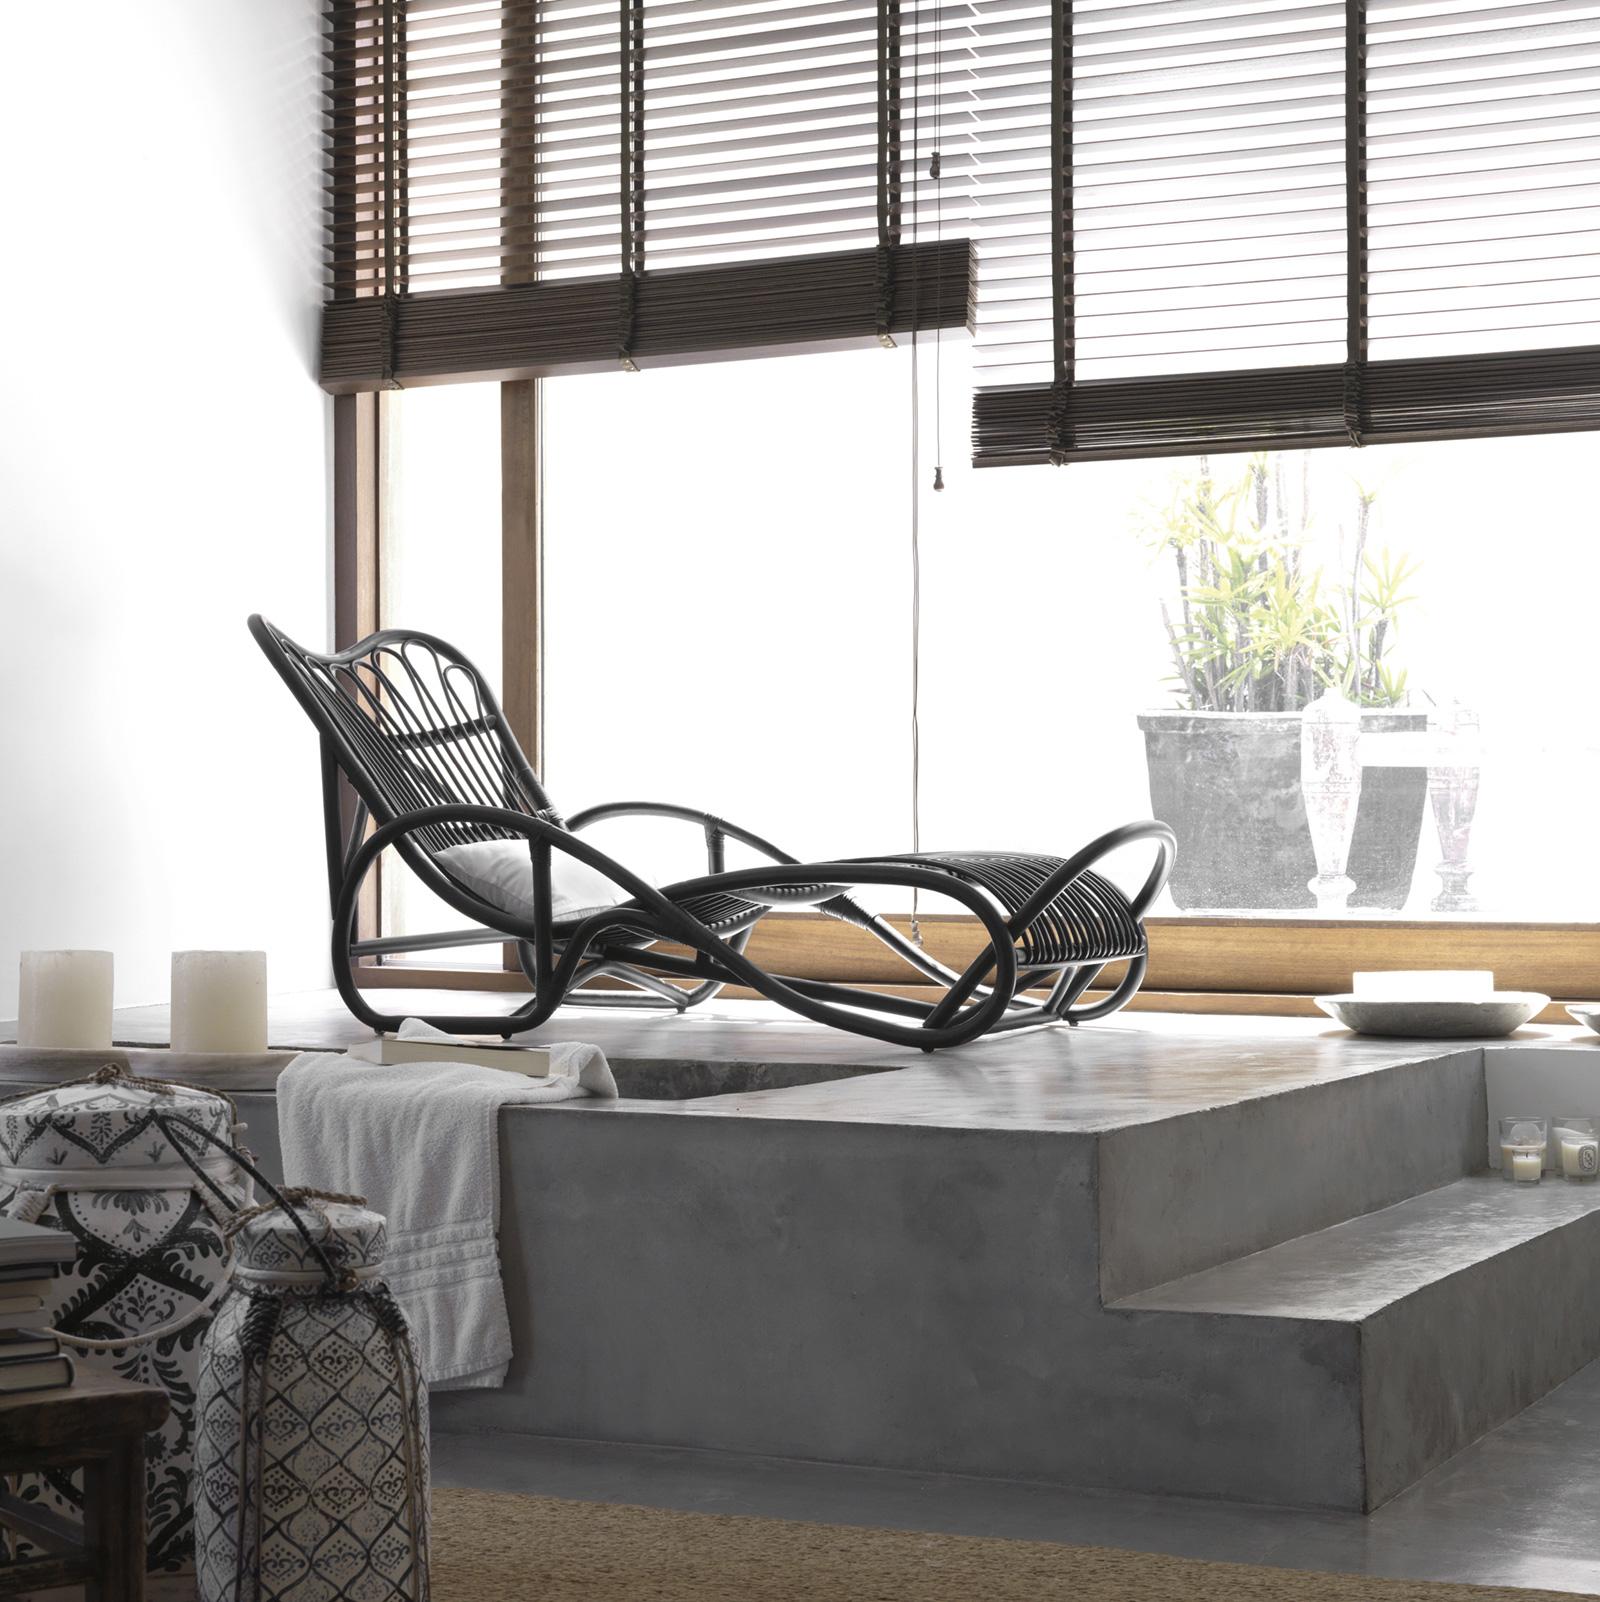 TinnappleMetz-Expormim-reposo-chaise-longue-02